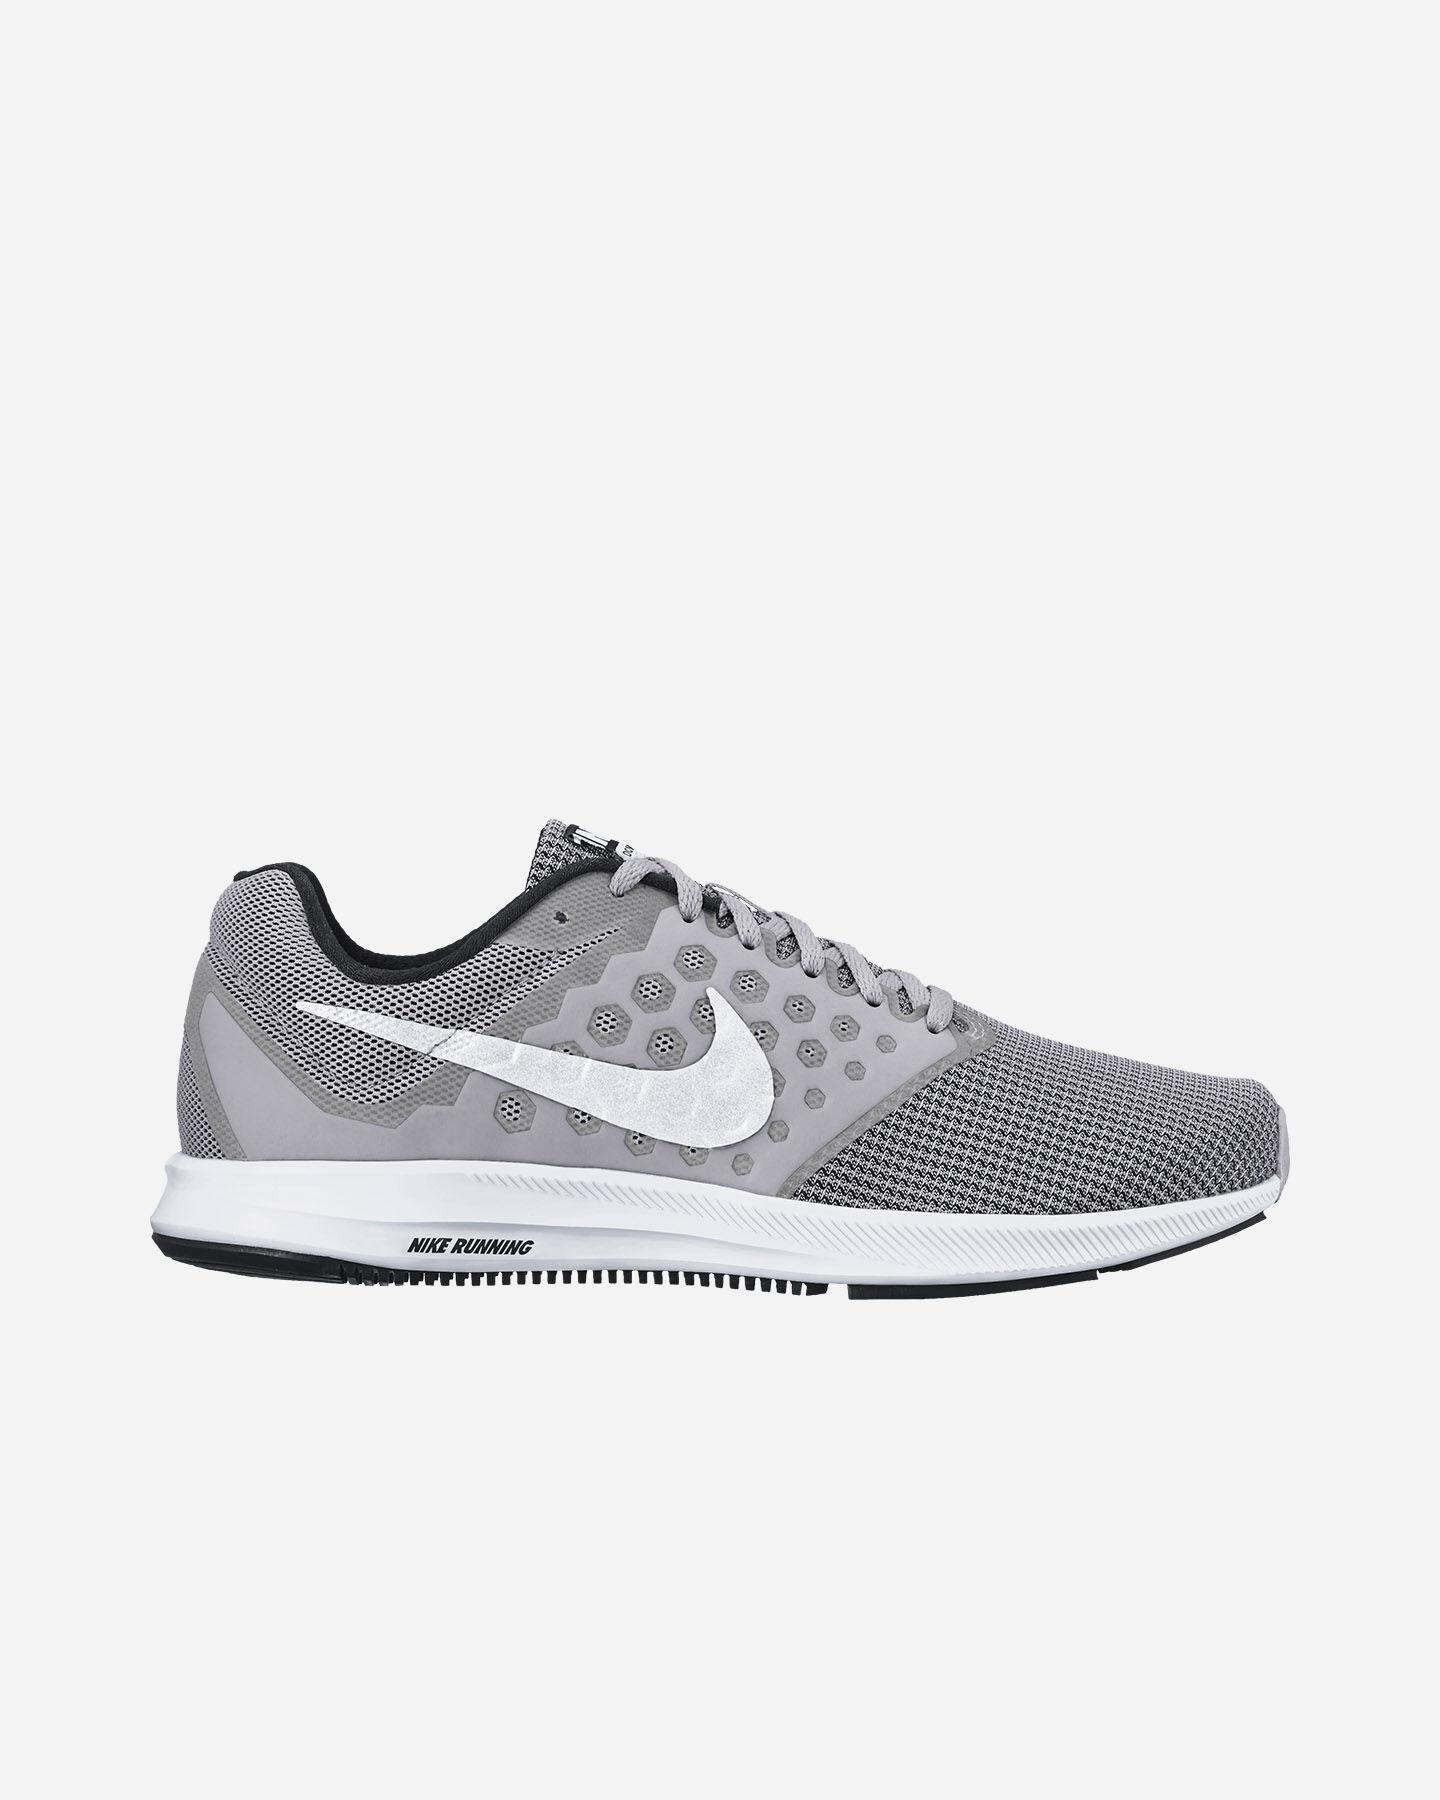 new product 606eb 32a83 ... da donna sneakers SNEAKERS SCARPE SPORTIVE BIANCO ORO,. NIKE  DOWNSHIFTER 852459 007 TG eur 41 US 8